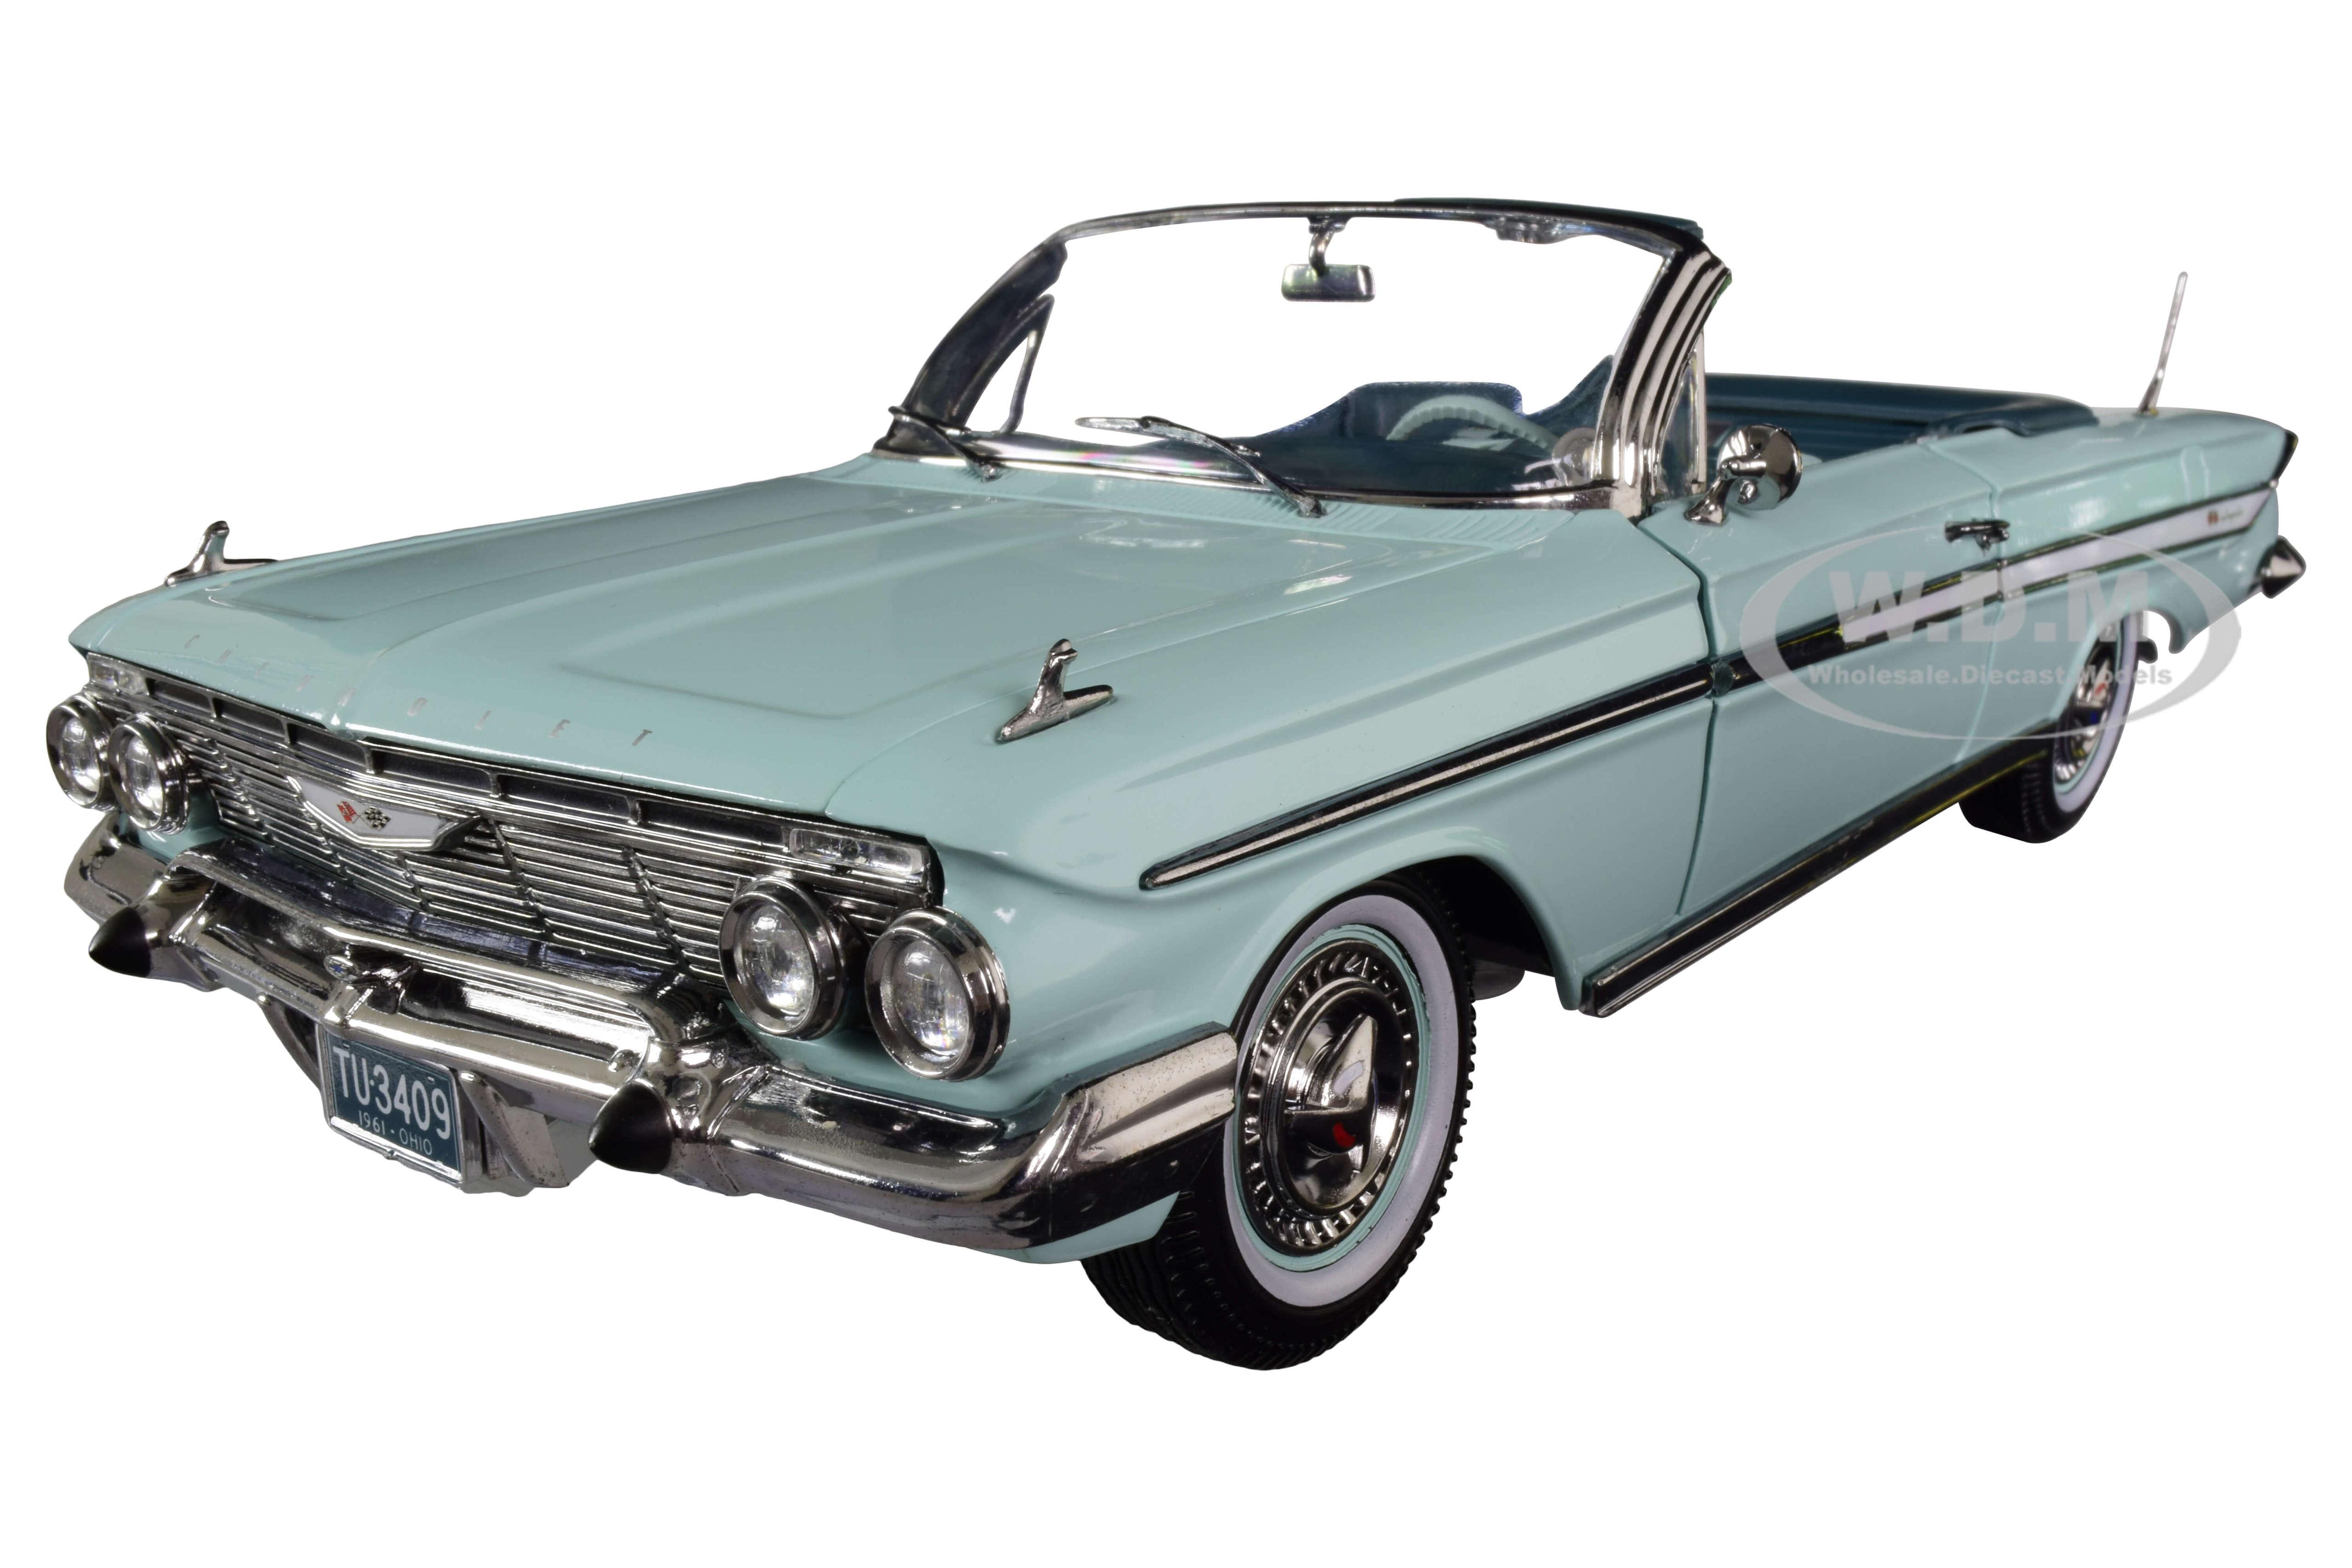 1961 Chevrolet Impala Open Convertible Seafoam Green 1/18 Diecast Model Car by SunStar